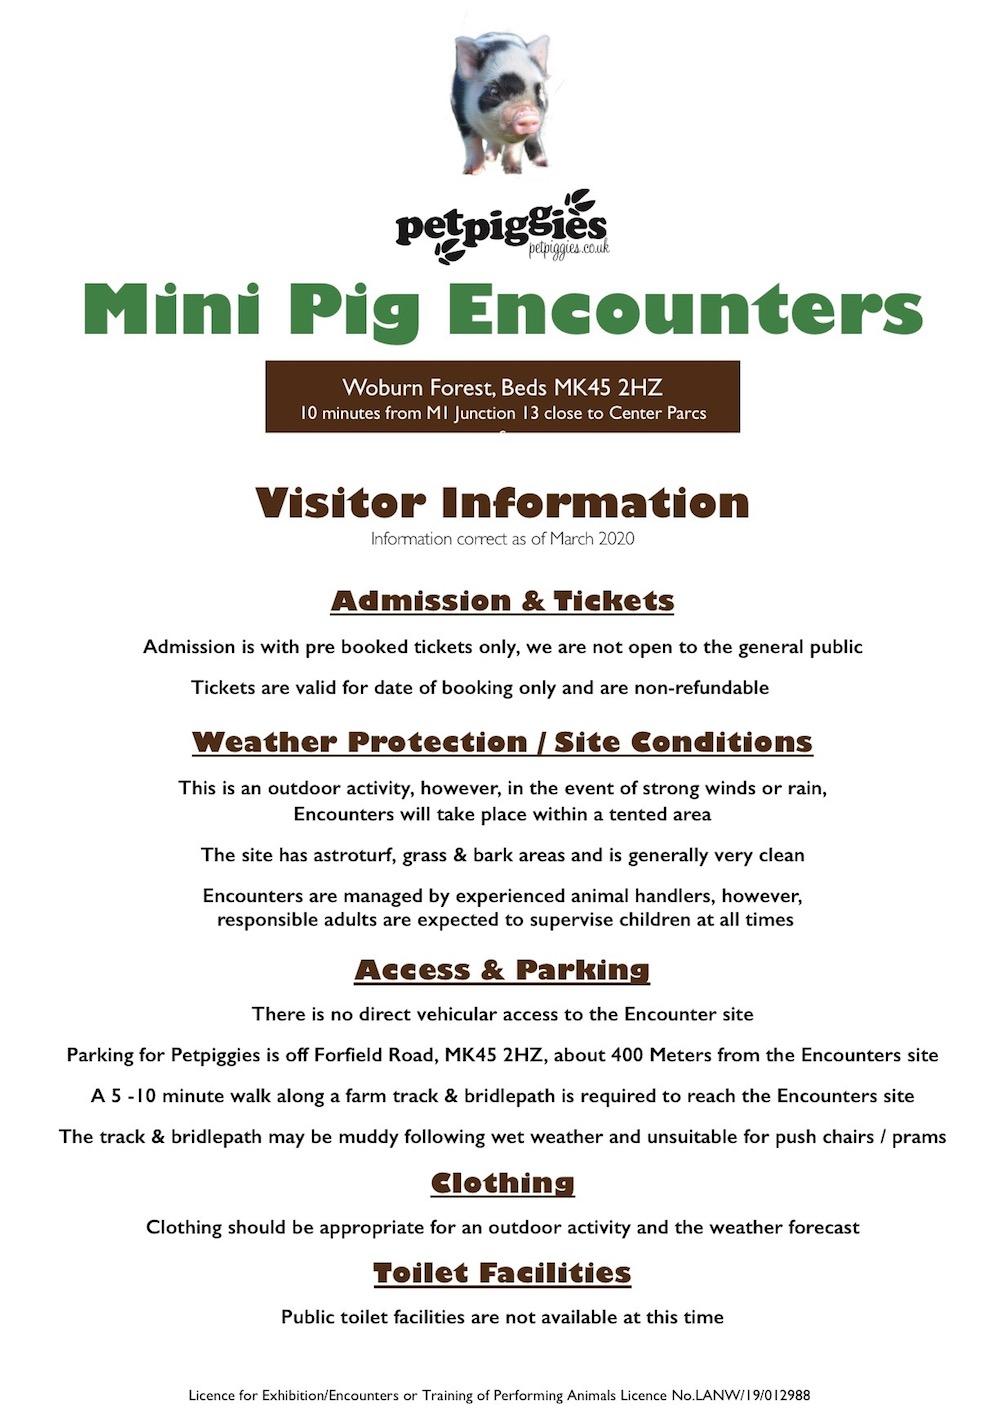 Petpiggies Mini Pig Encounters